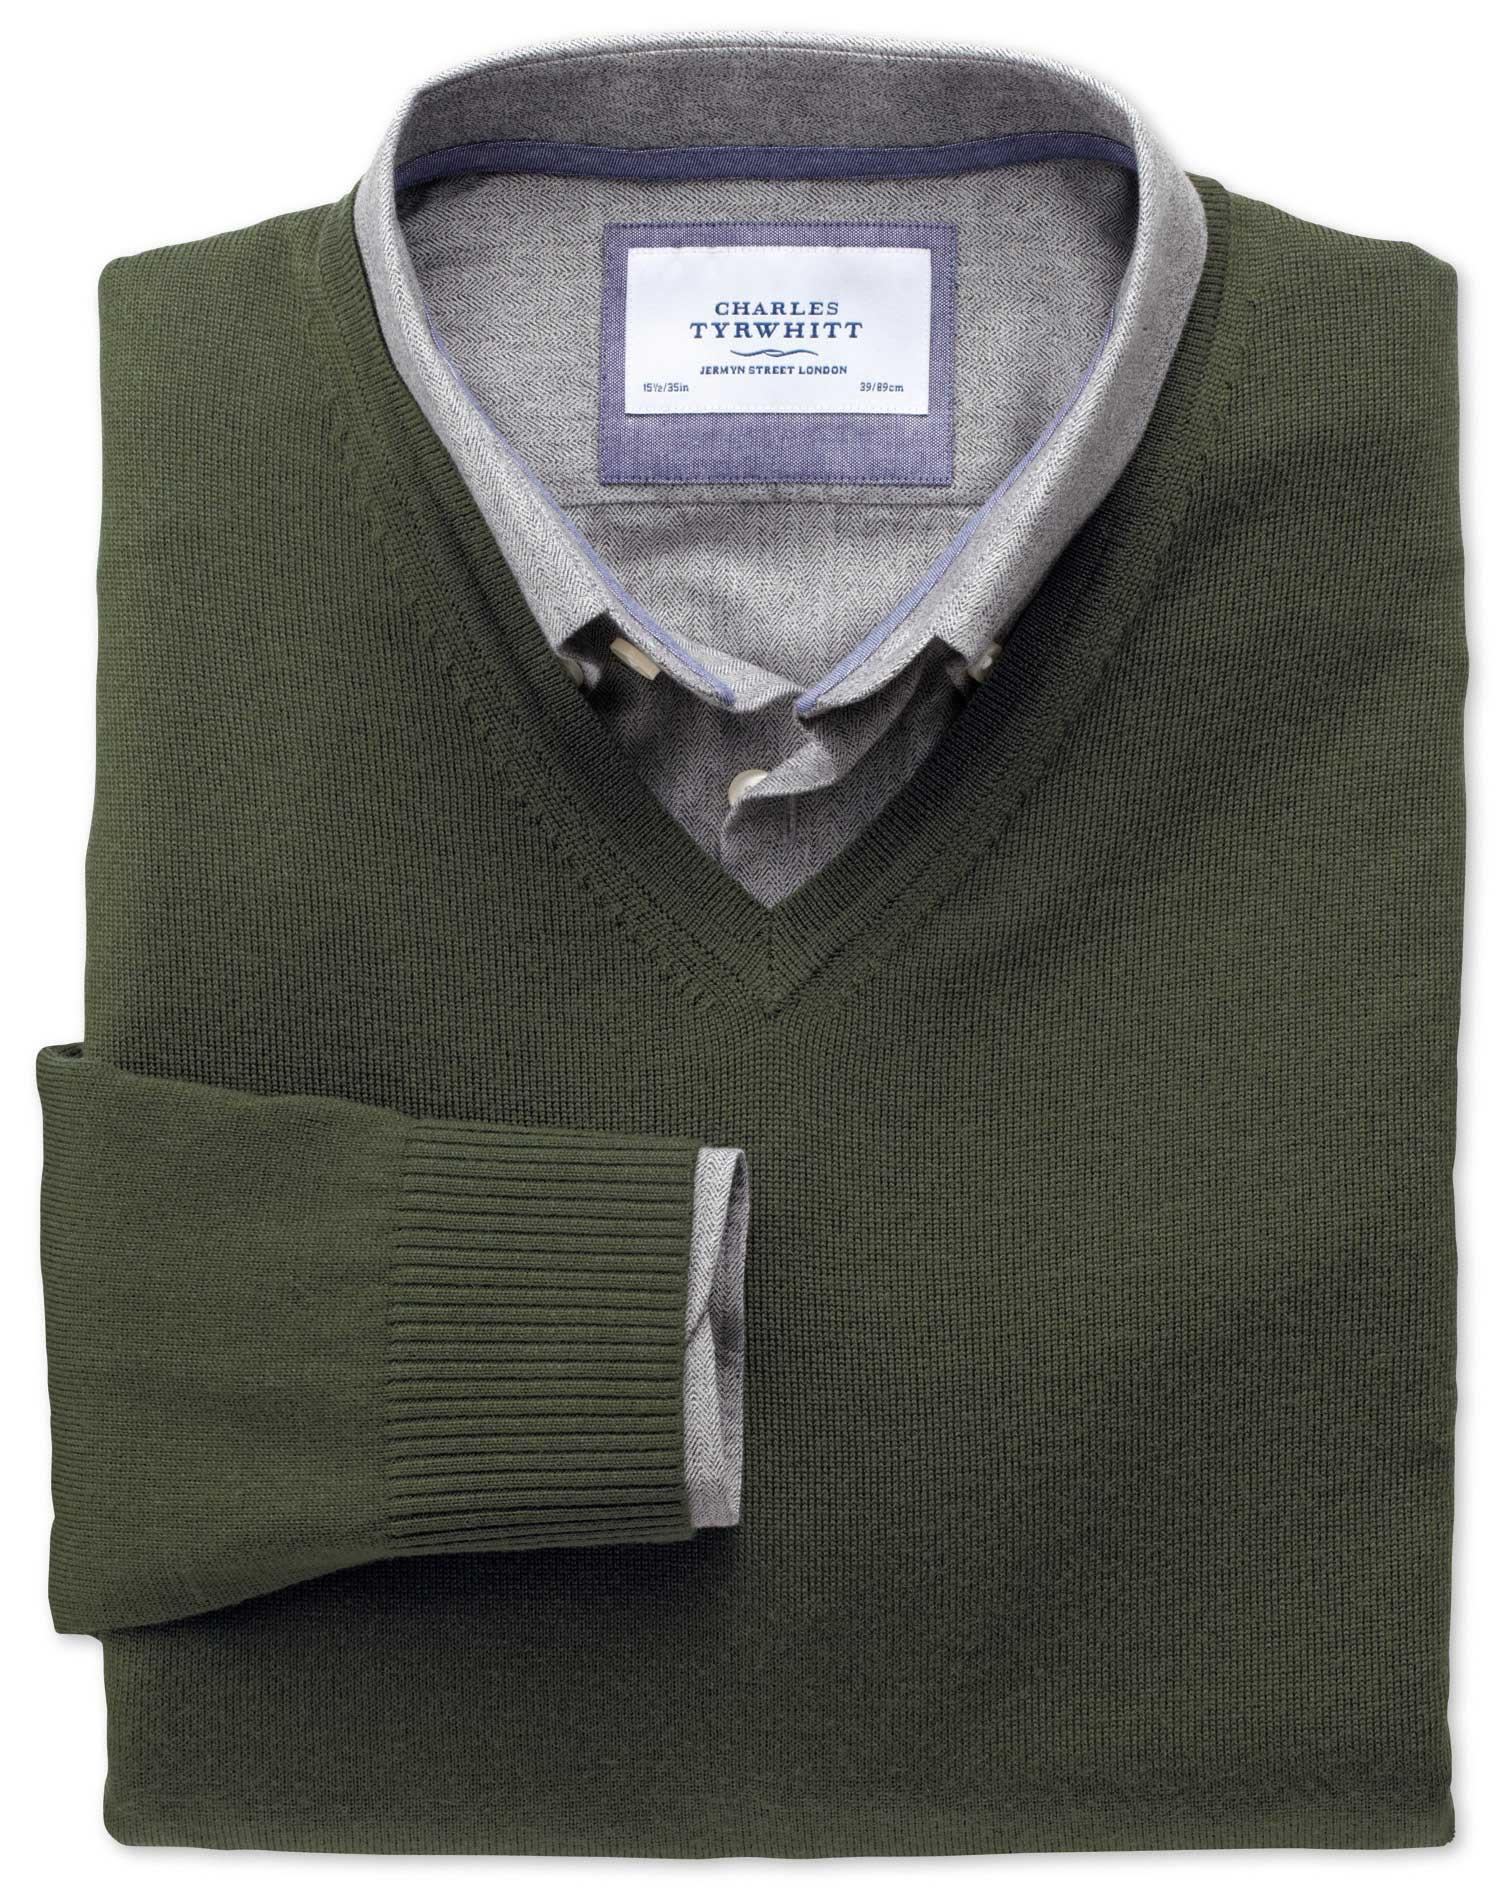 Dark Green Merino V-Neck Wool Jumper Size XL by Charles Tyrwhitt